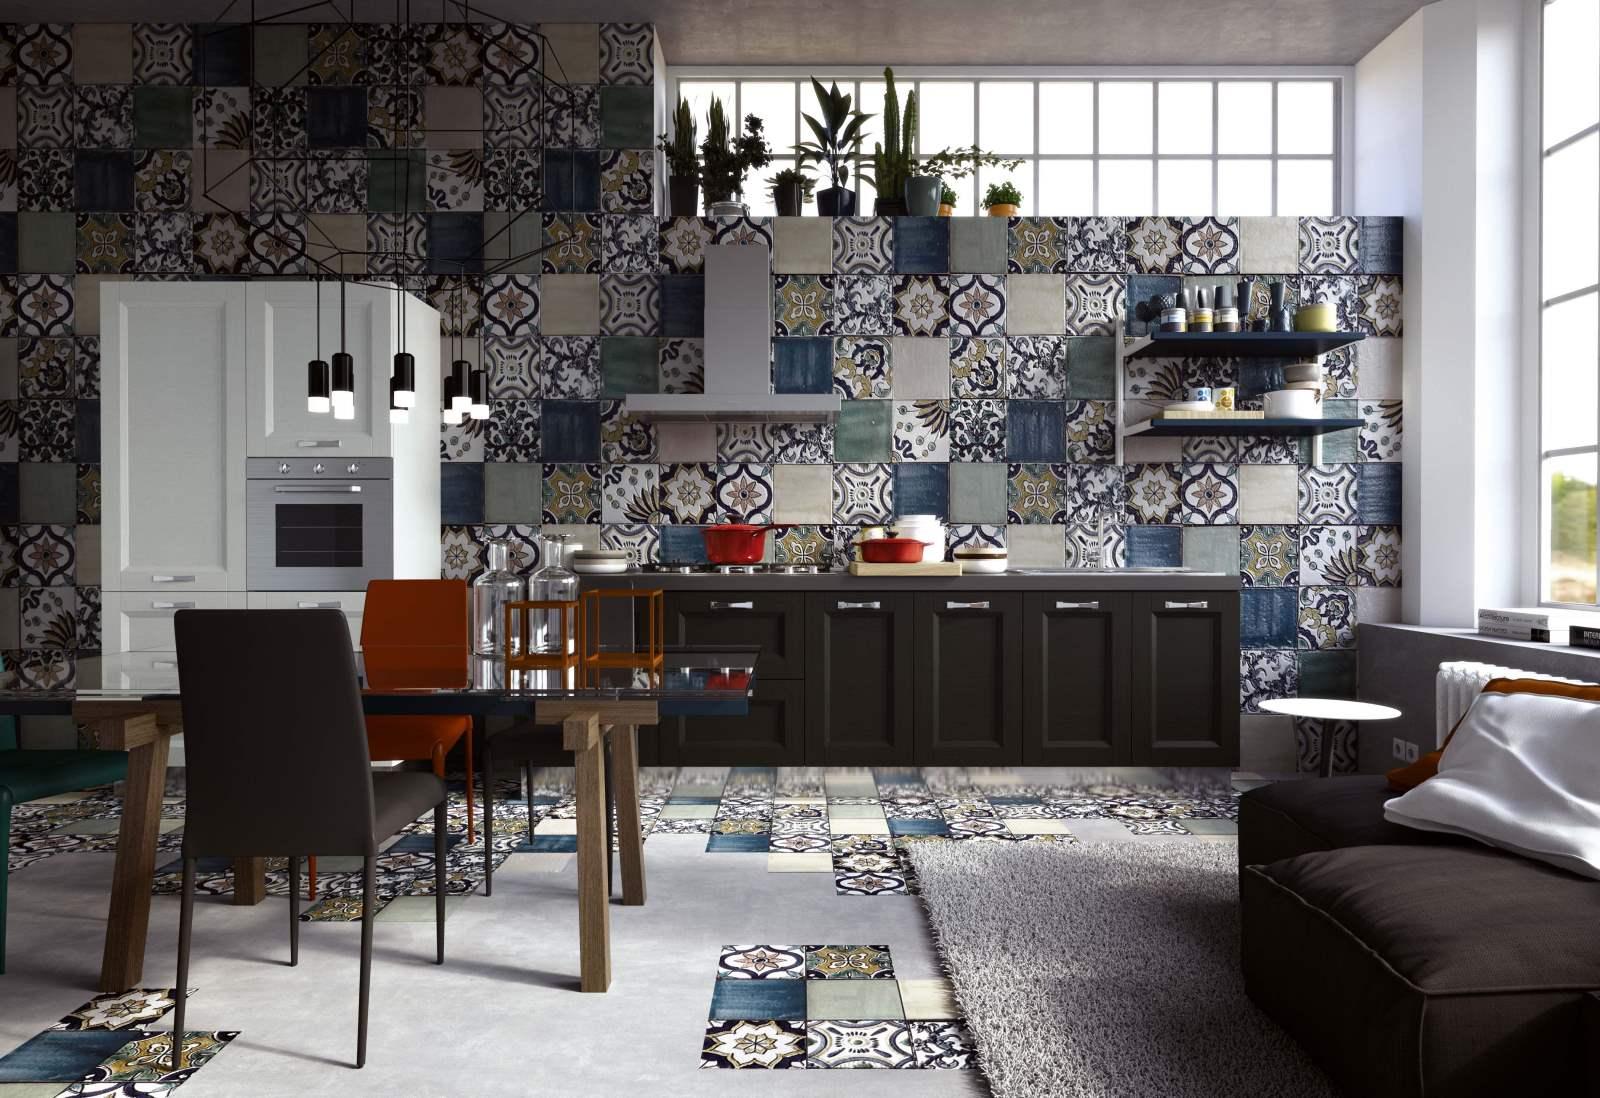 cucina_ada_home_decor_set_1